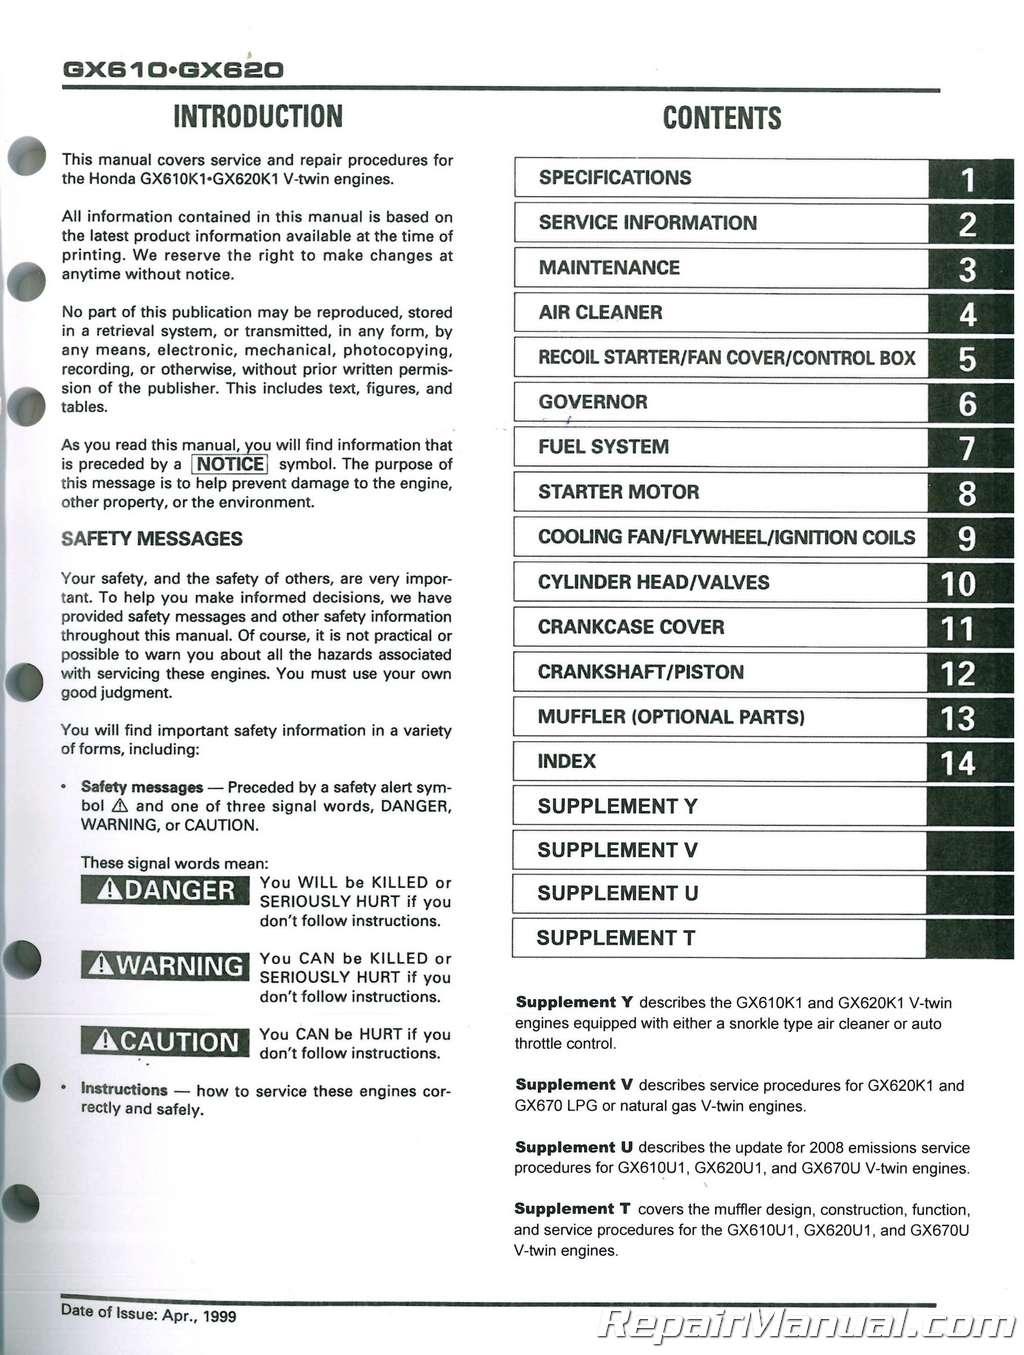 Honda Gx610k1 Gx620k1 Engine Shop Manual Gx670 Wiring Diagram